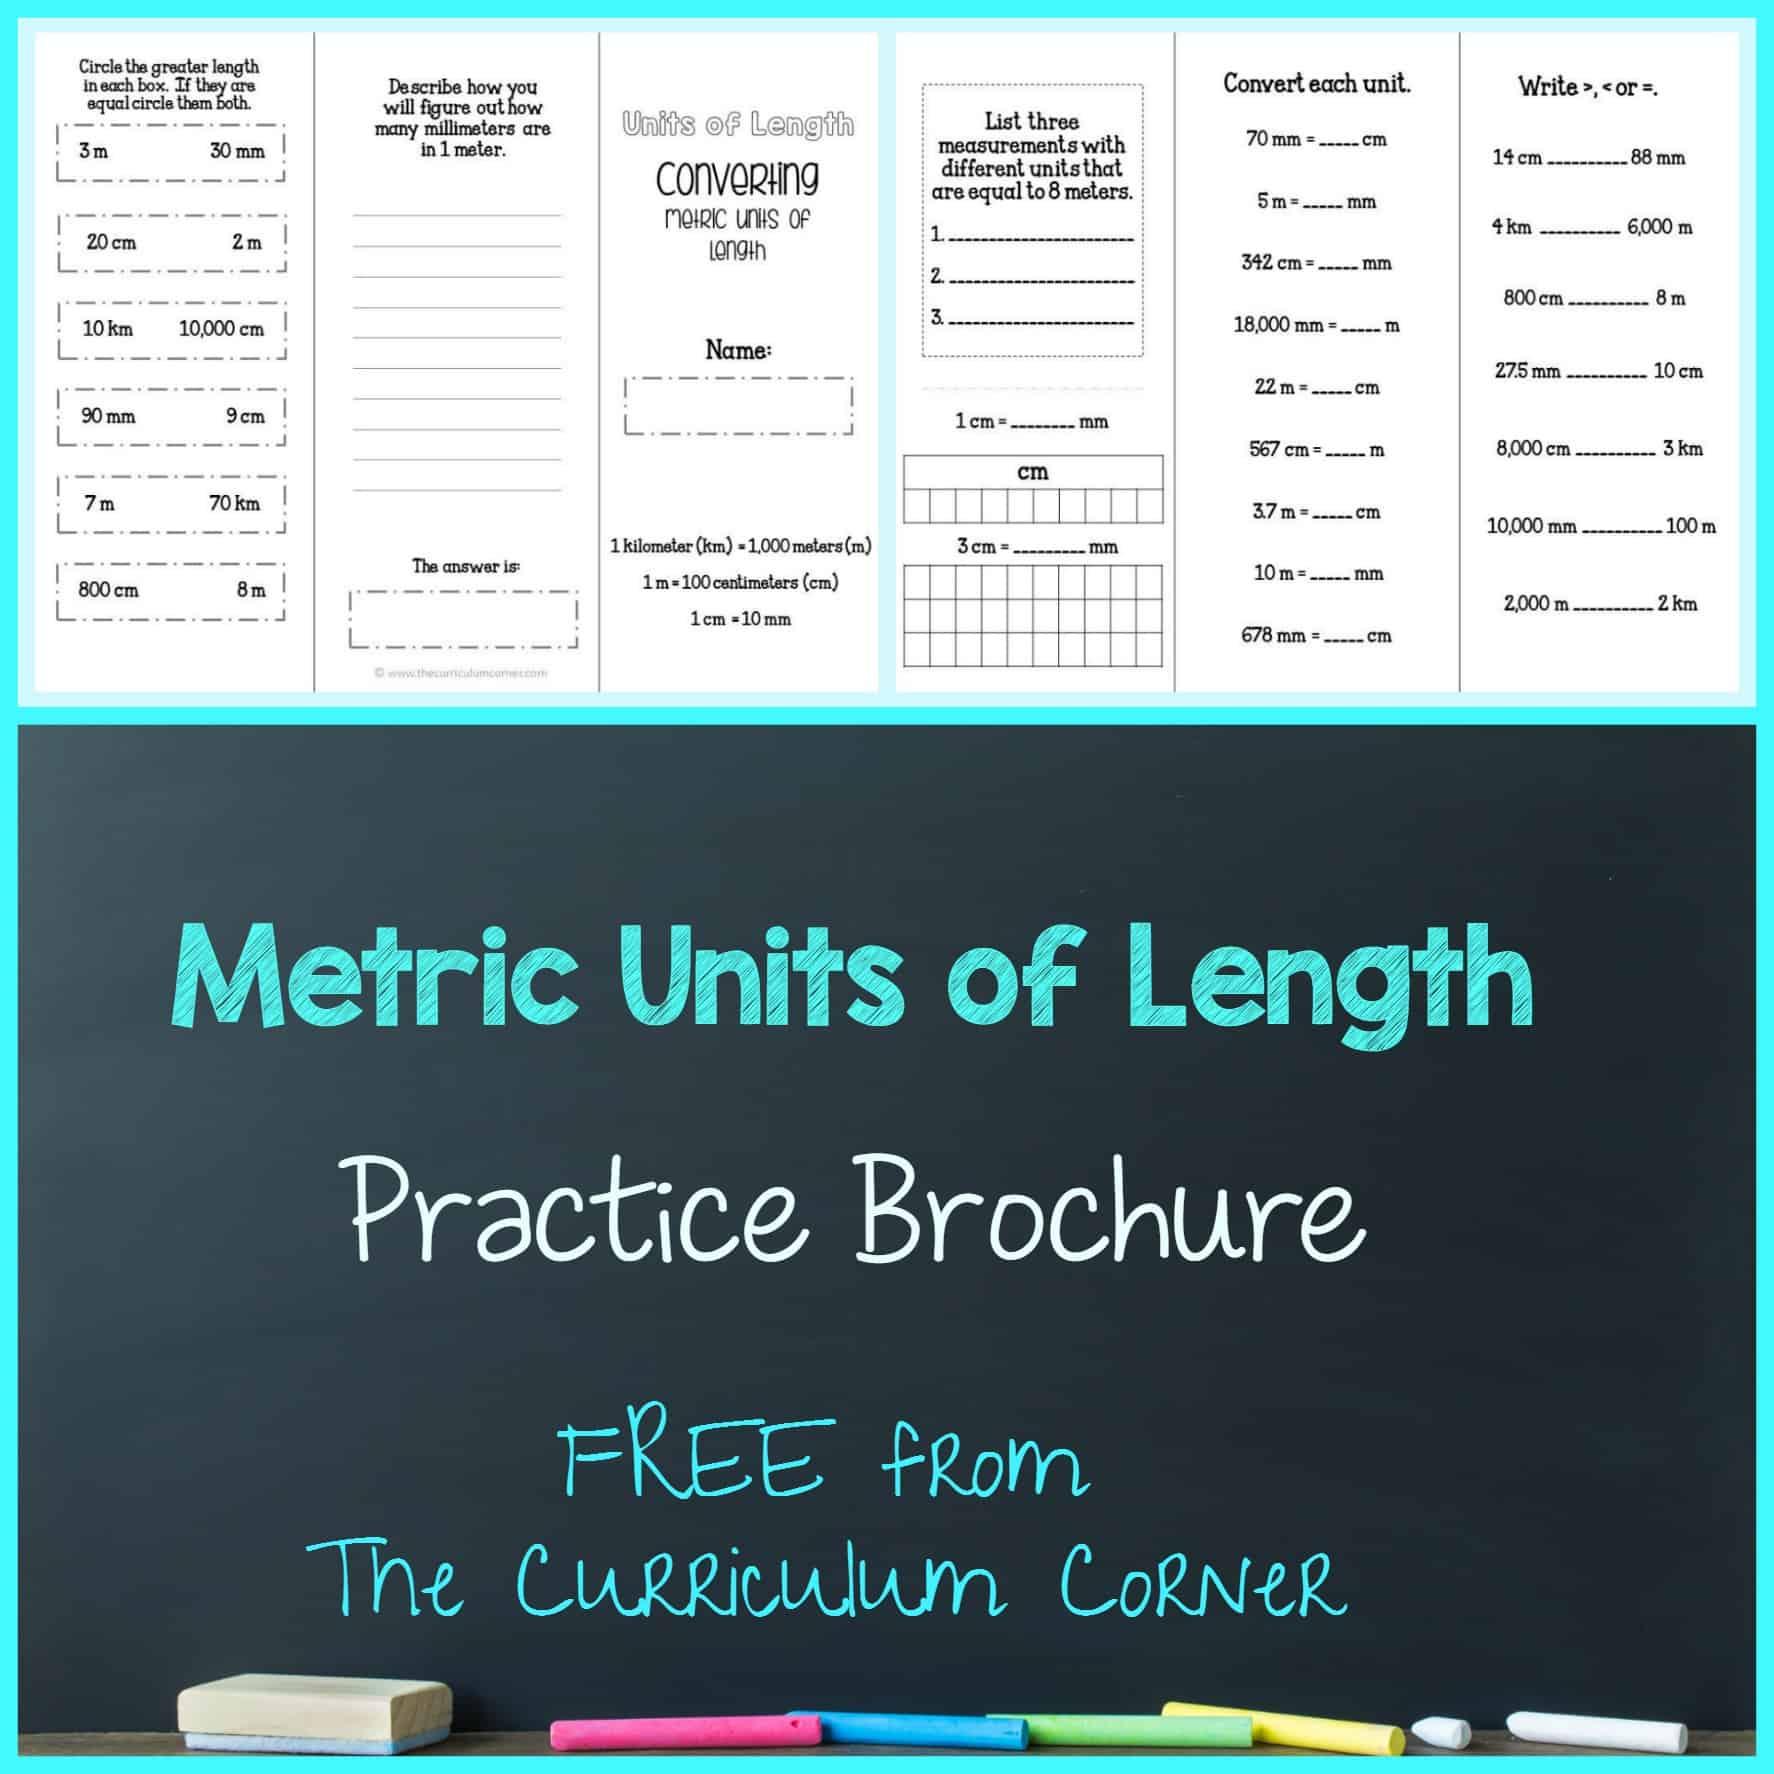 Converting Metric Units Of Length Brochure